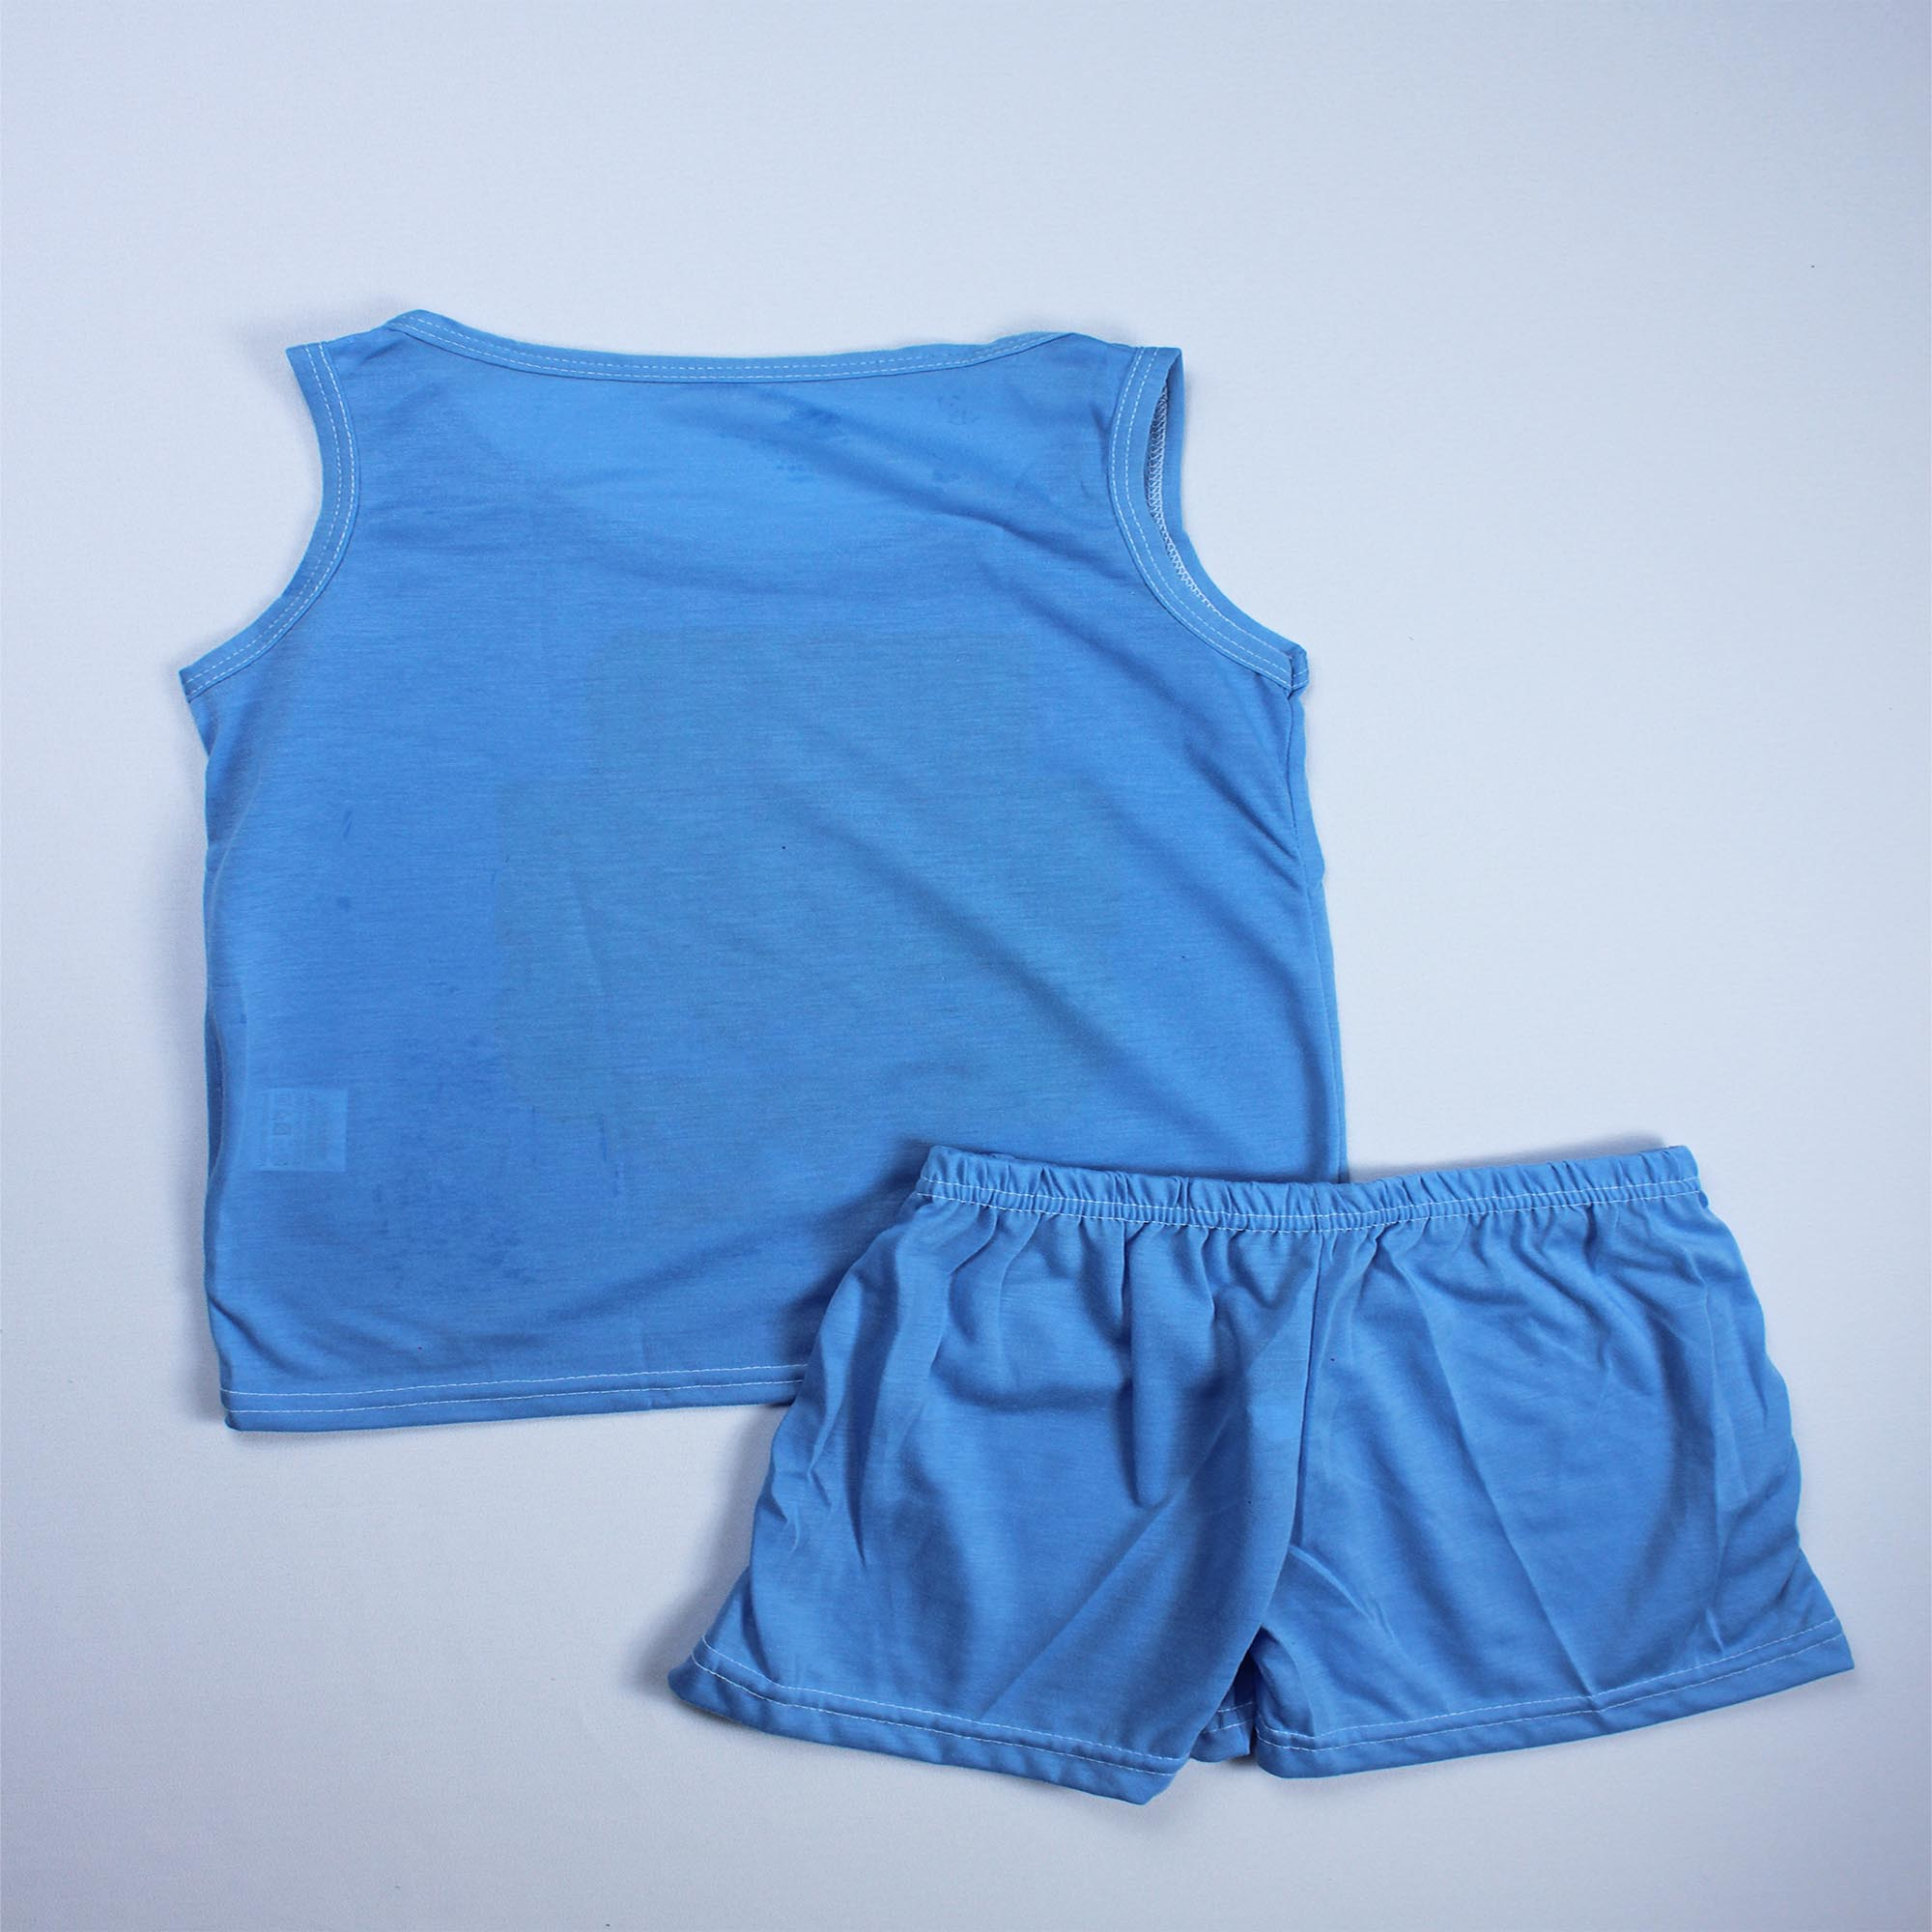 Pijama Regata Infantil Menino - Tamanho 10